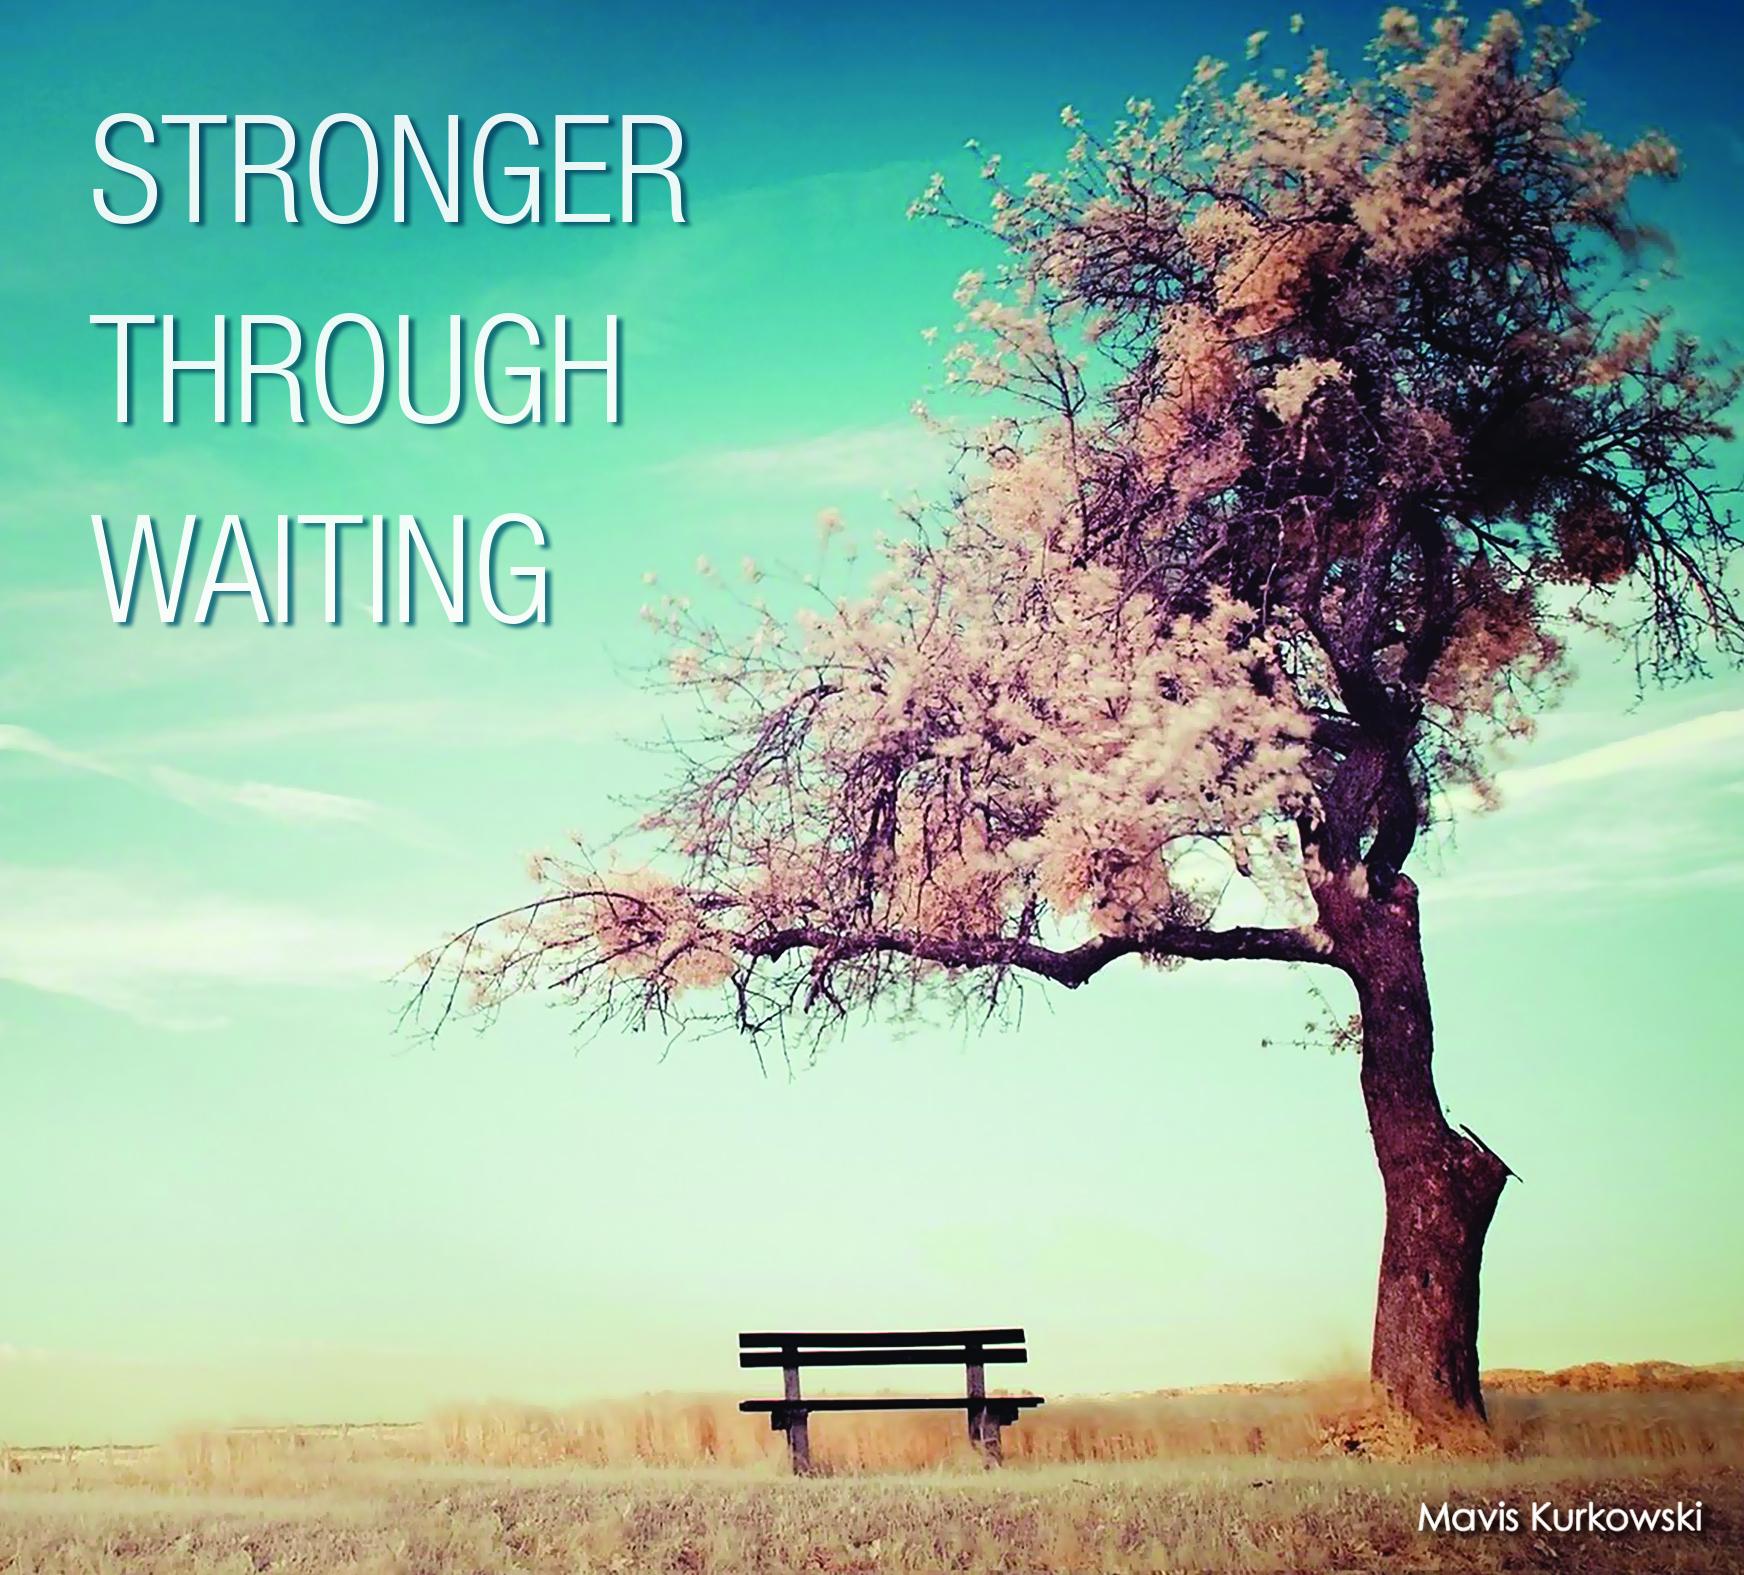 Stronger Through Waiting!